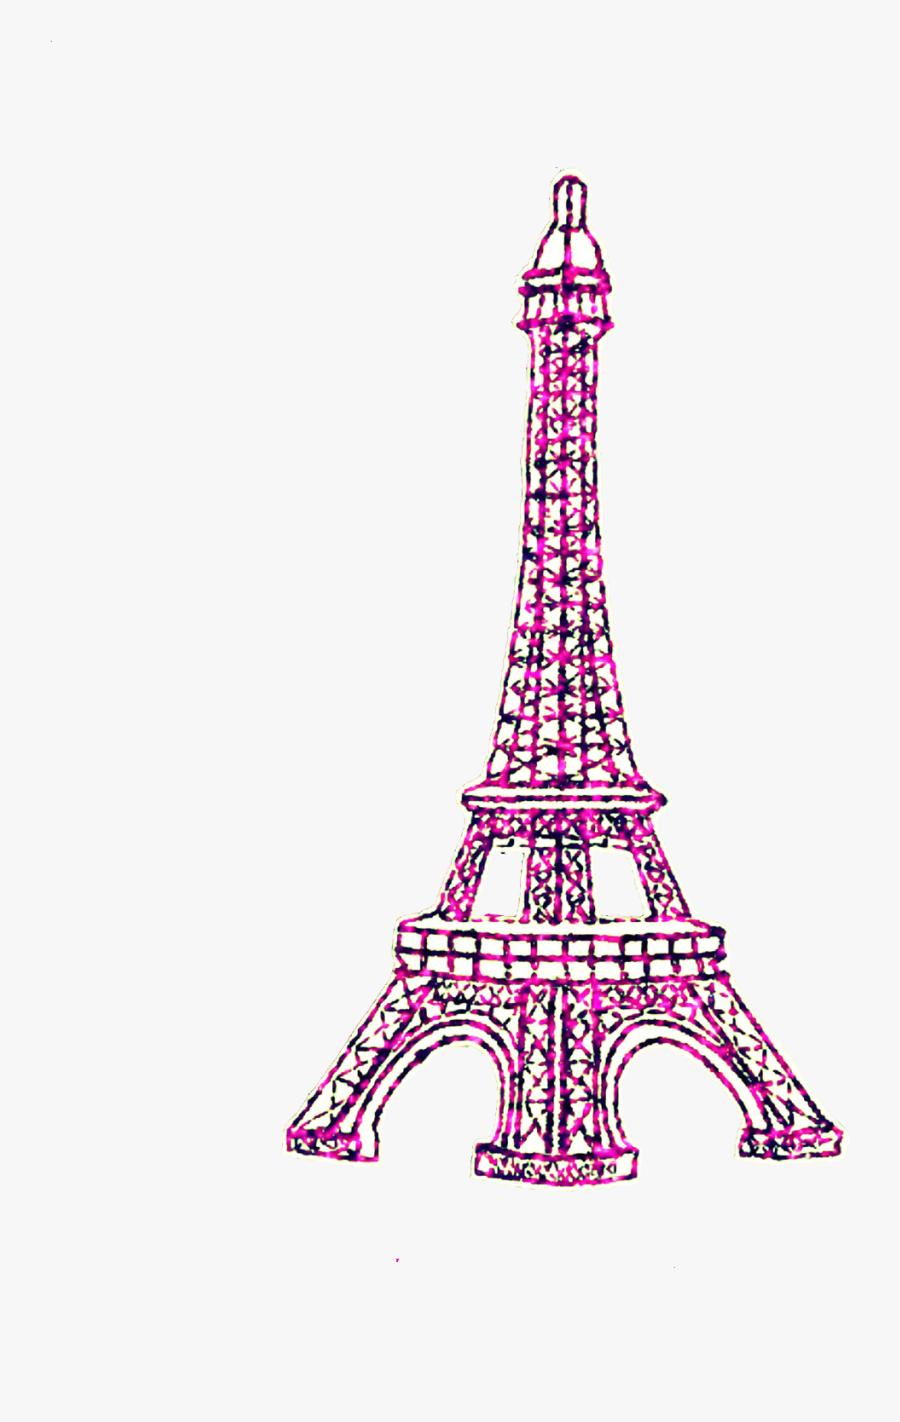 #ftedtickers #glitter #sparkle #pink #paris #eiffeltower - Cute Eiffel Tower Png, Transparent Clipart